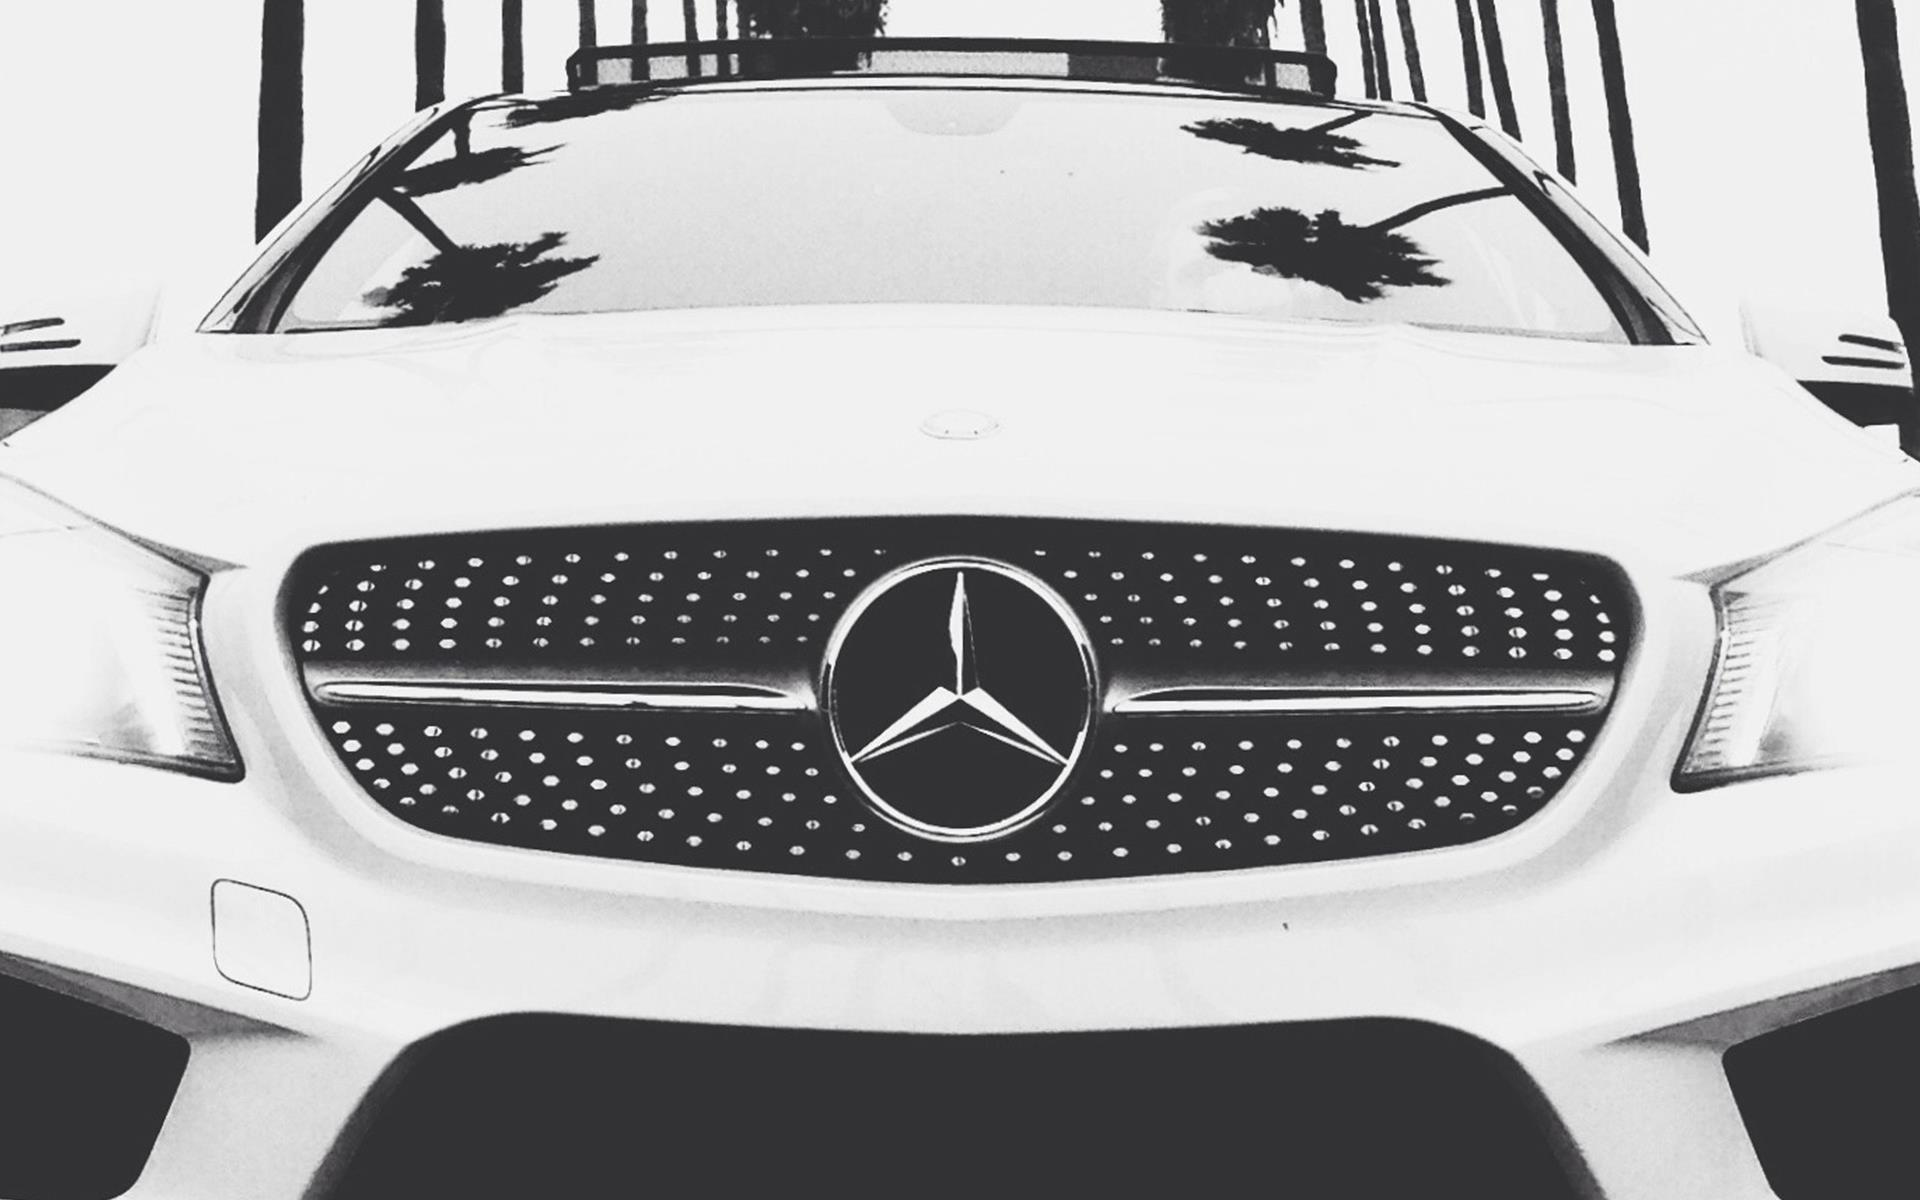 2016 mercedes benz cla class wallpapers hd drivespark. Black Bedroom Furniture Sets. Home Design Ideas